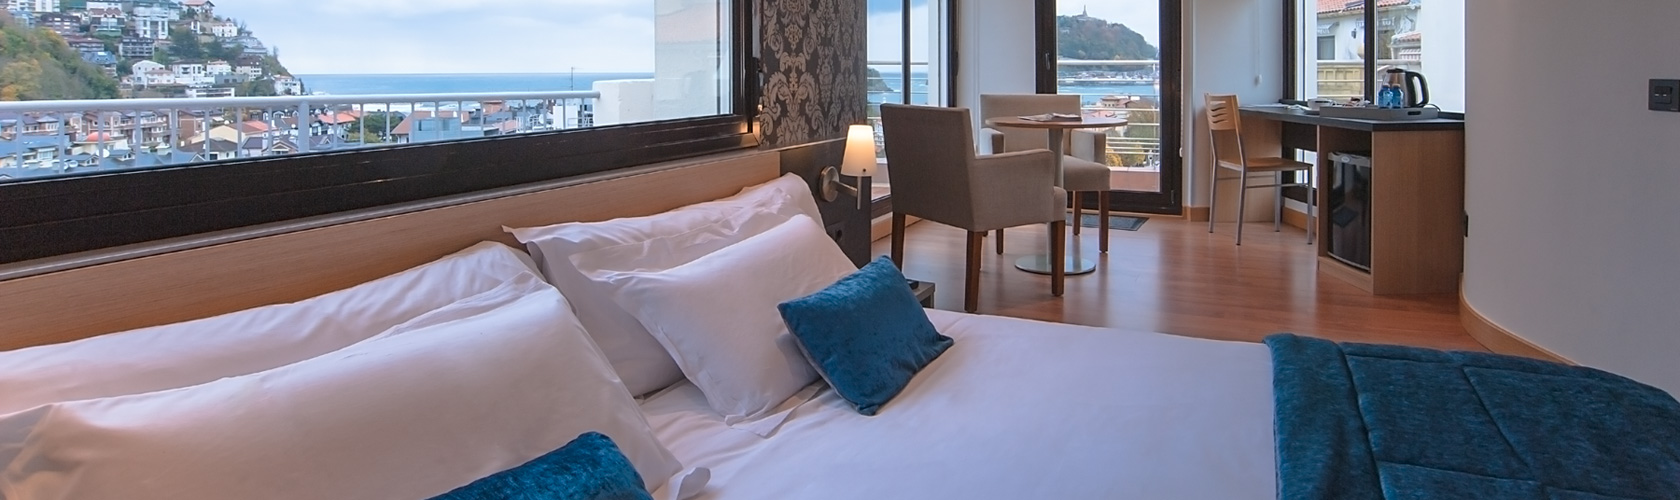 Hotel Codina, Cross 3 Playas Grupo Delta